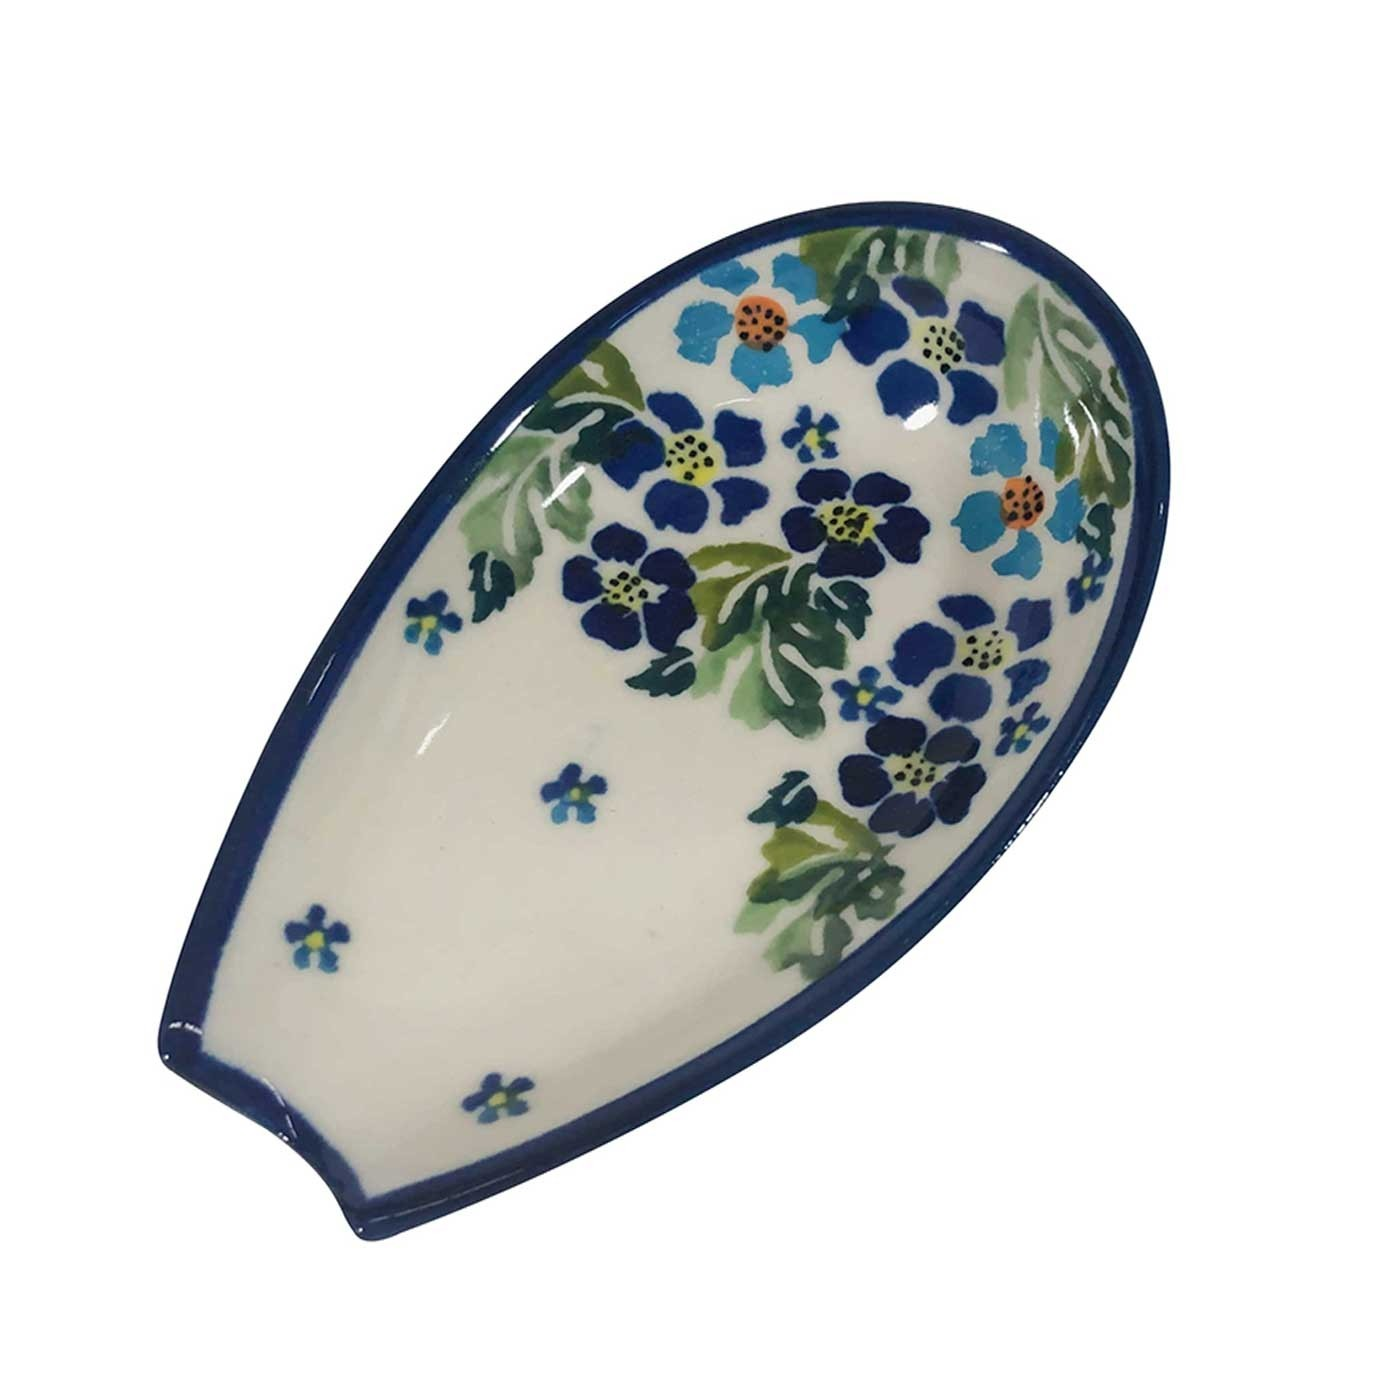 "Pottery AvenueTrue Blues 5"" Stoneware Spoon Rest"